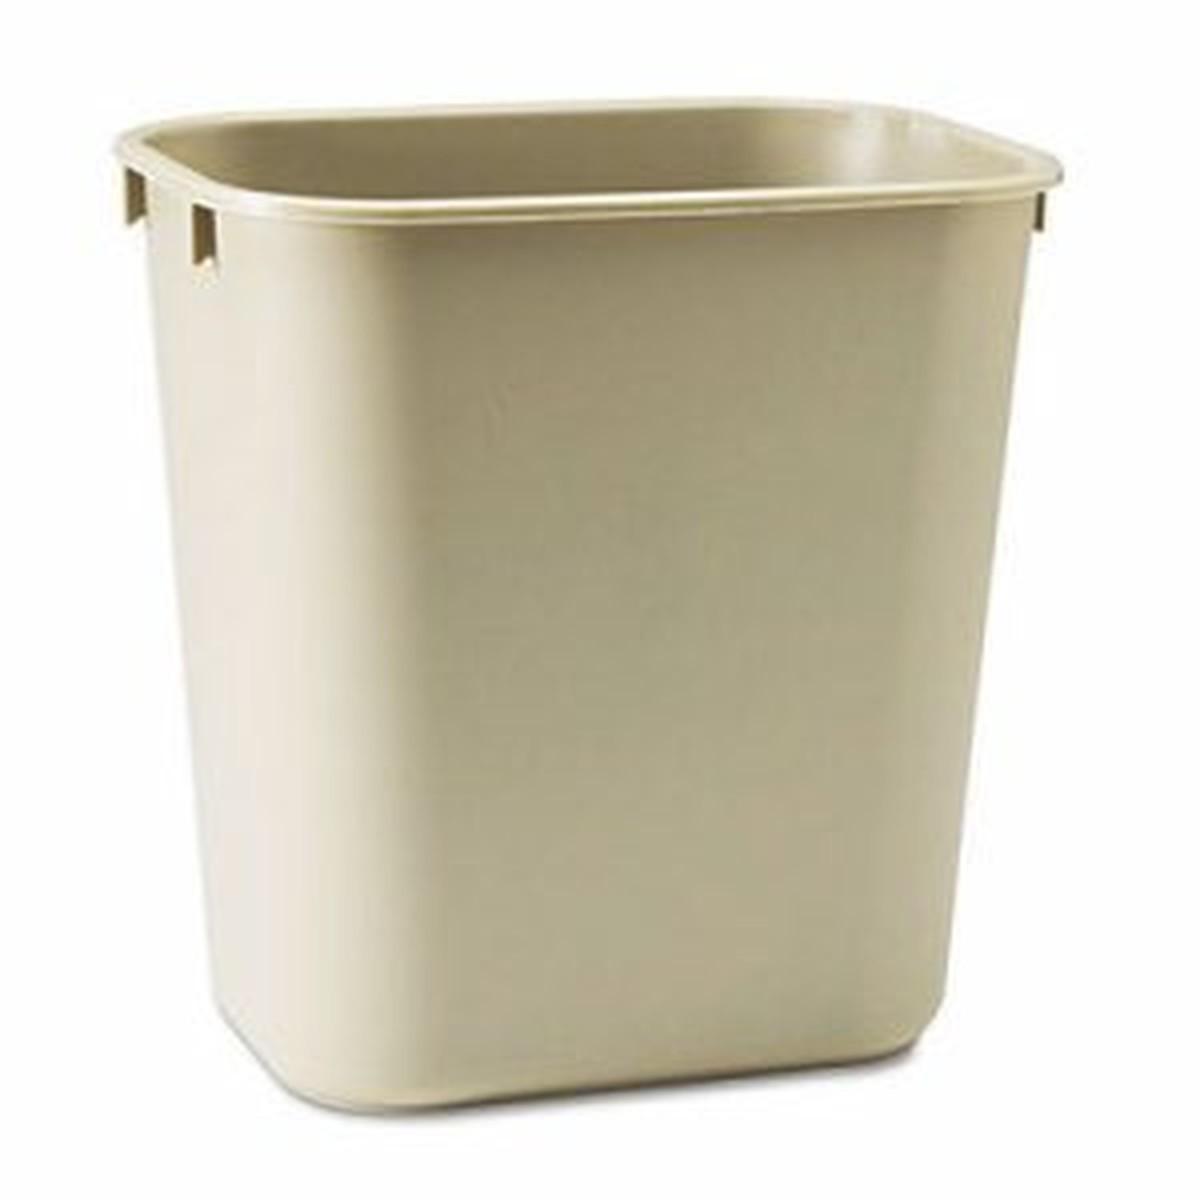 Deskside Plastic Wastebasket, Rectangular, 3 1/2 gal, Beige